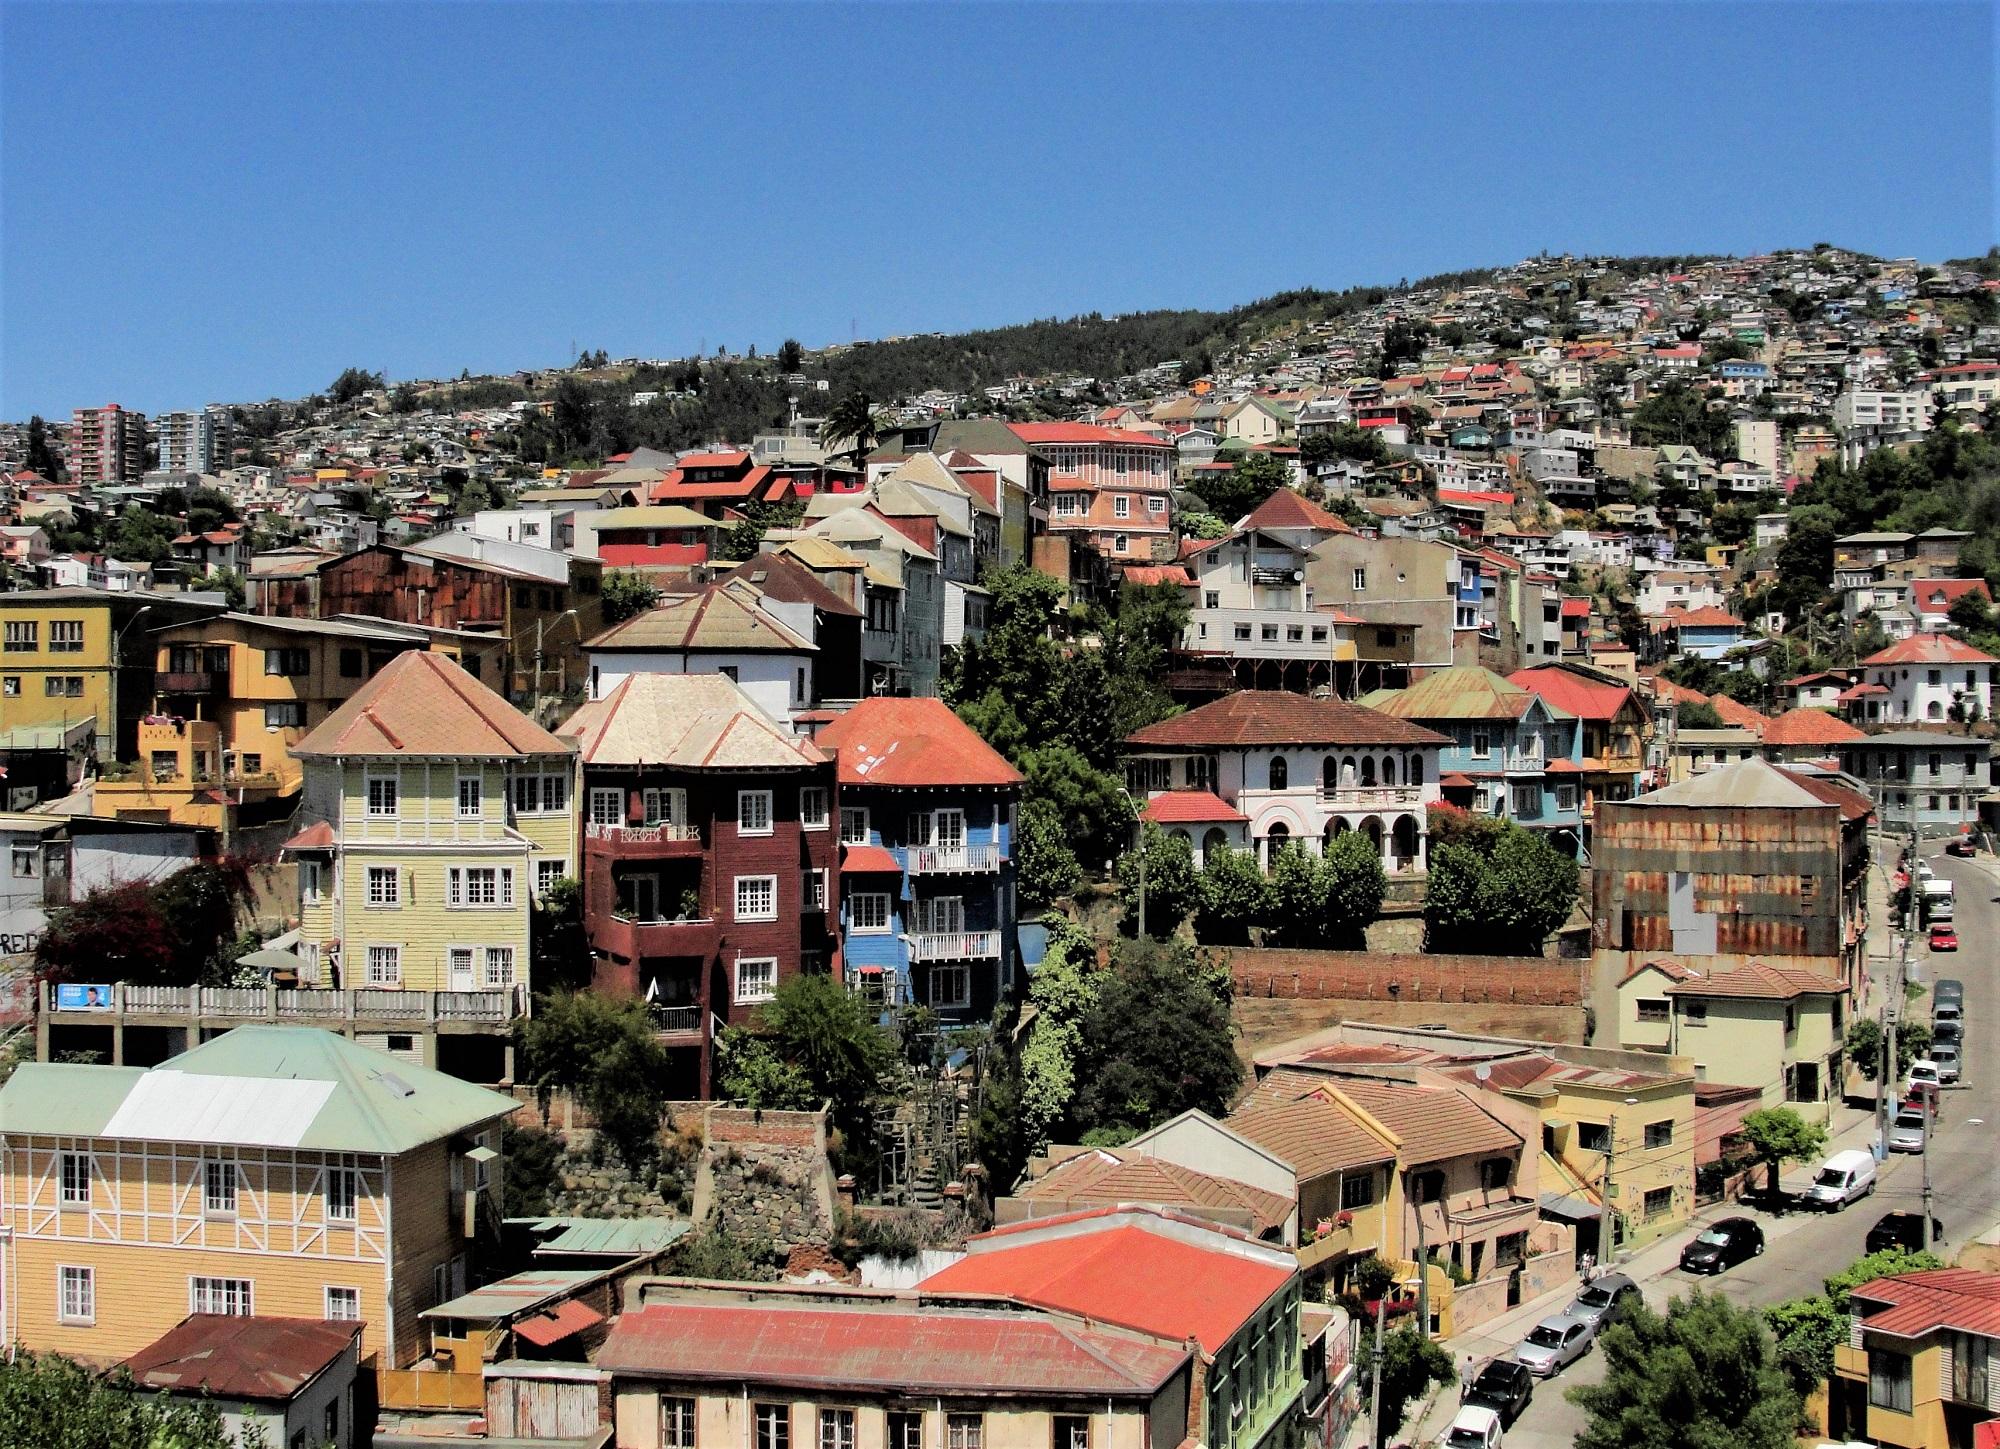 turismochile_valparaiso_vista